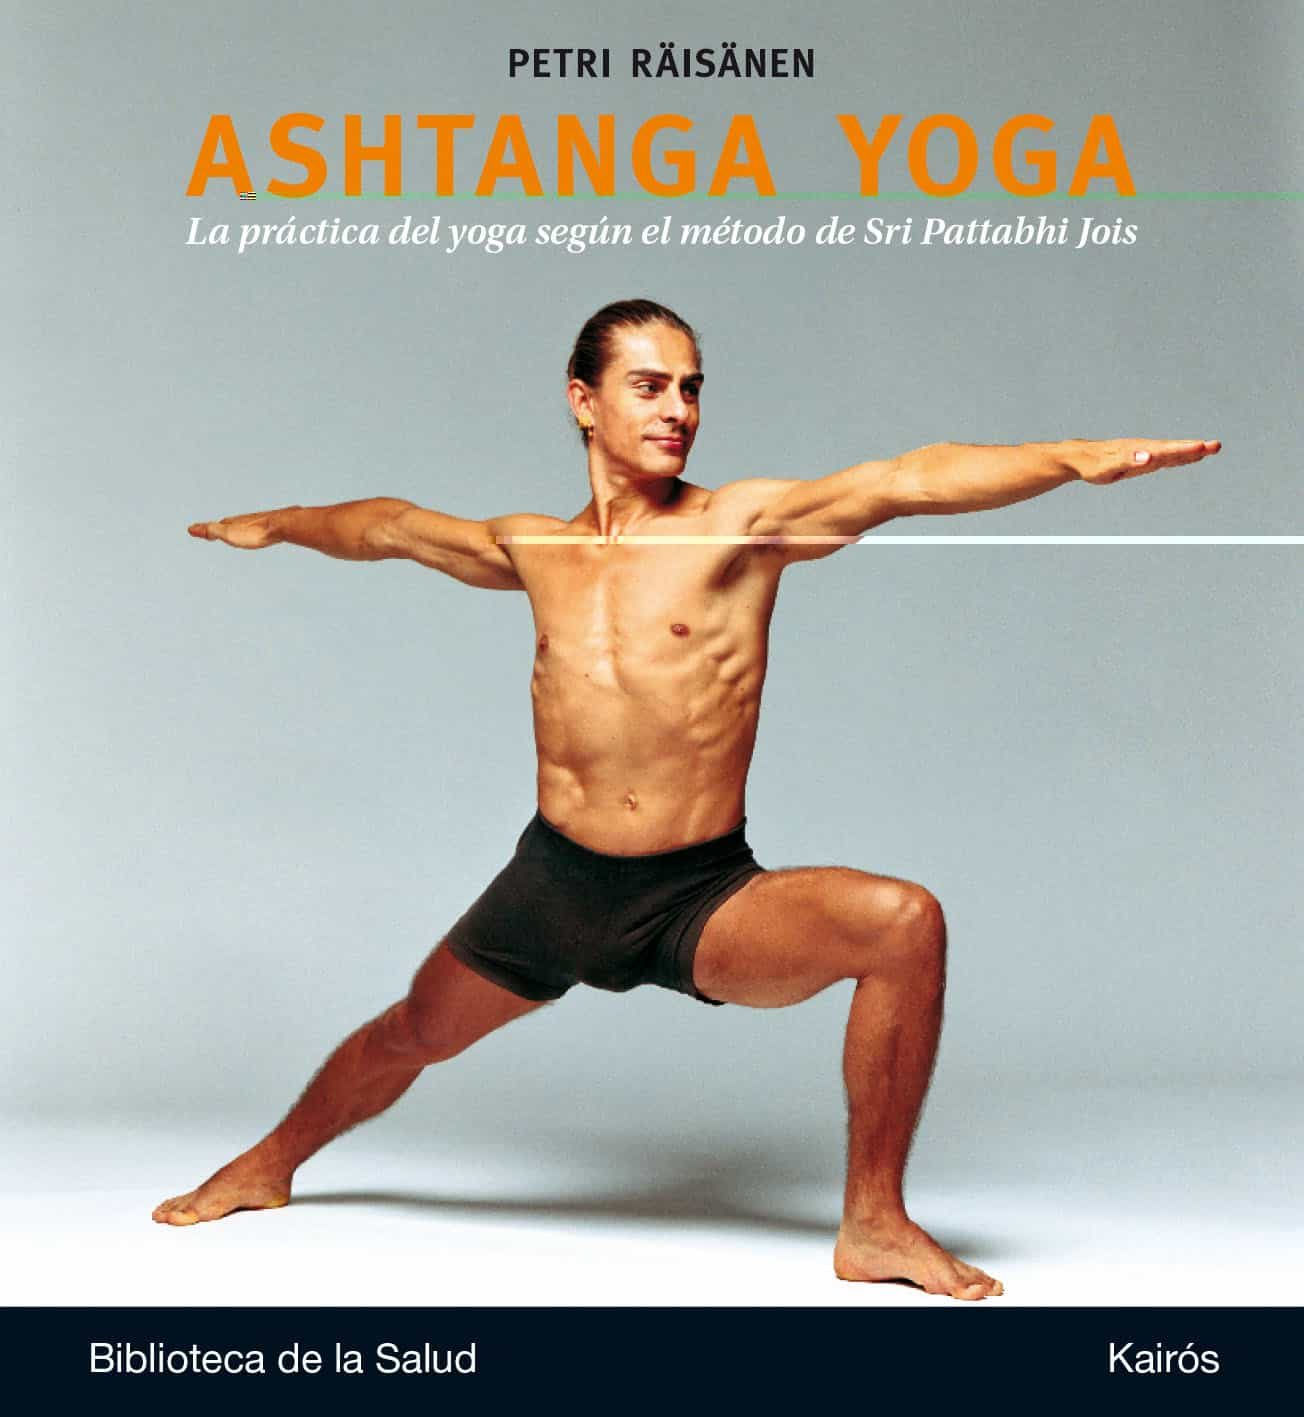 ashtanga yoga-petri raisanen-9788499884097